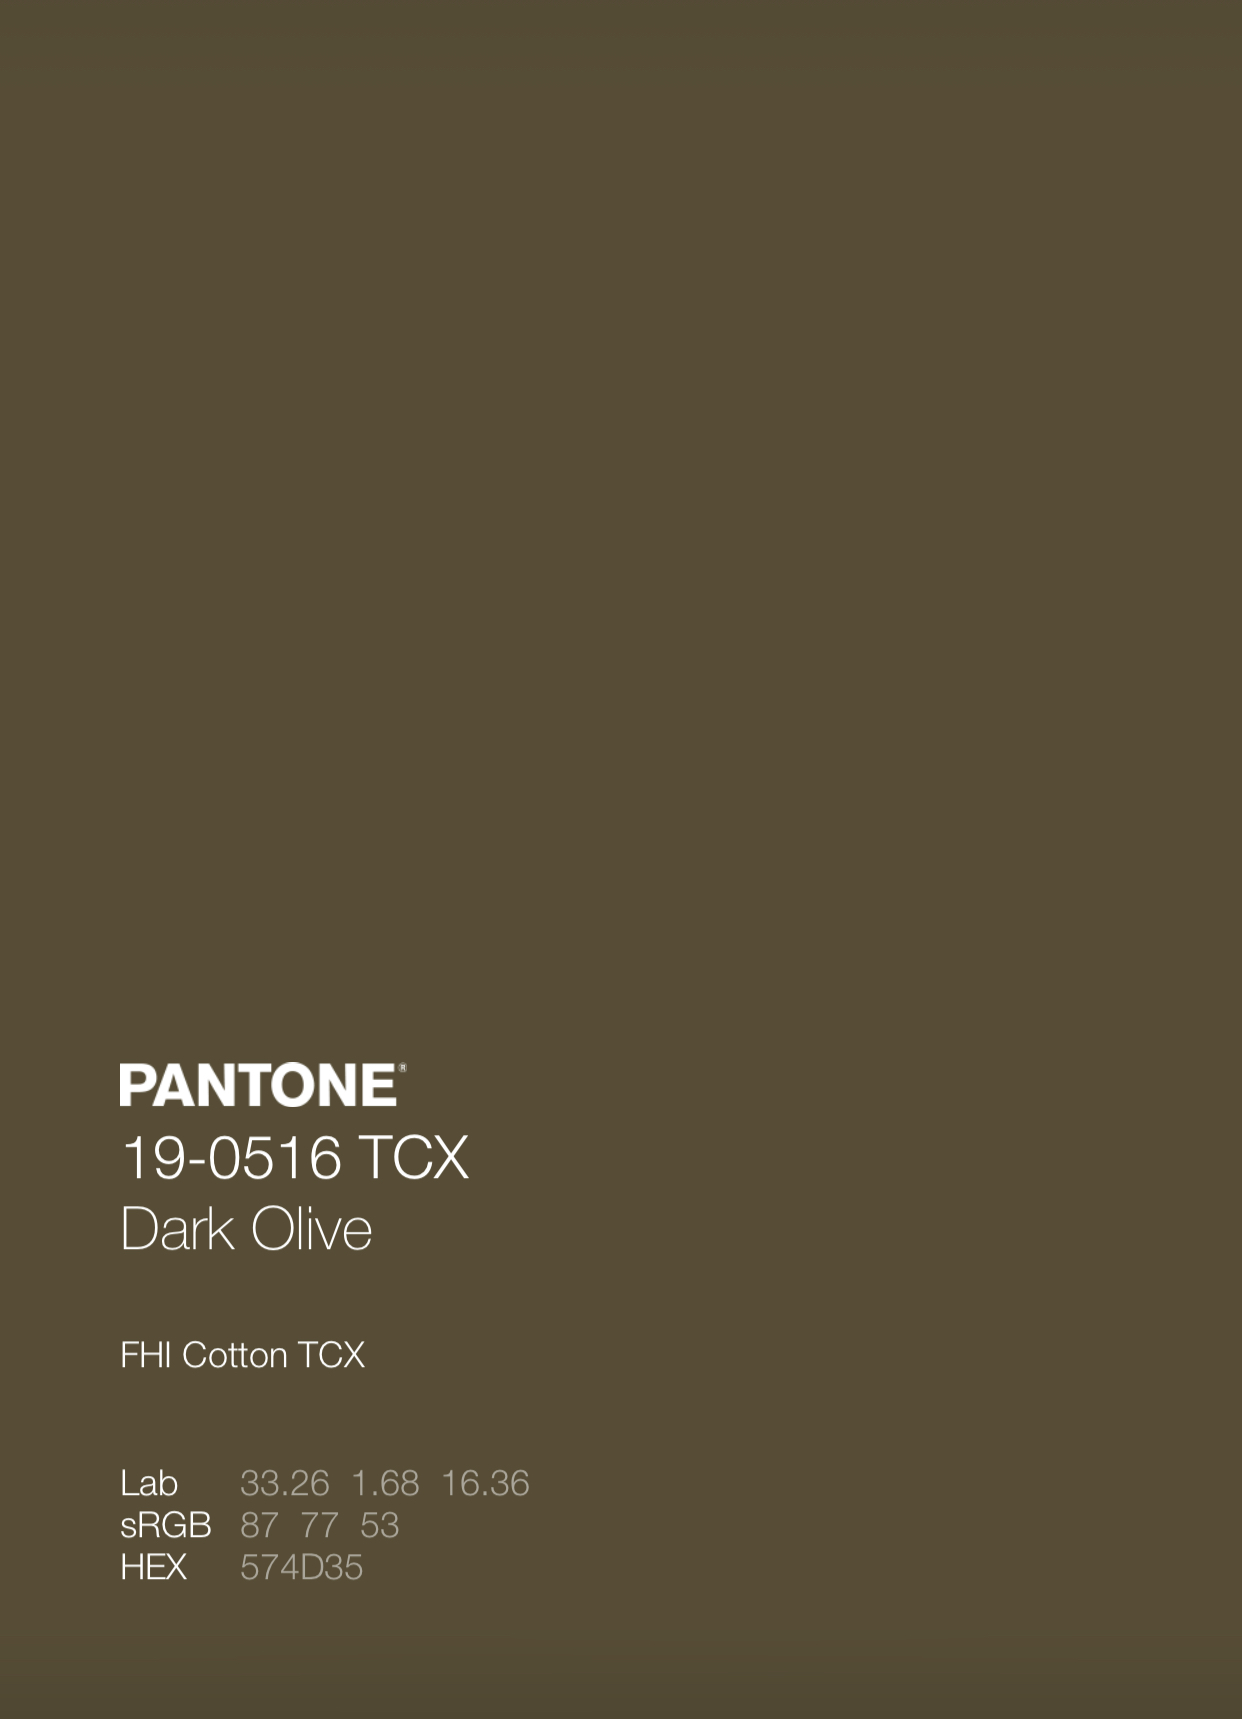 """Mon Petit Chou"" Pantone Colors"